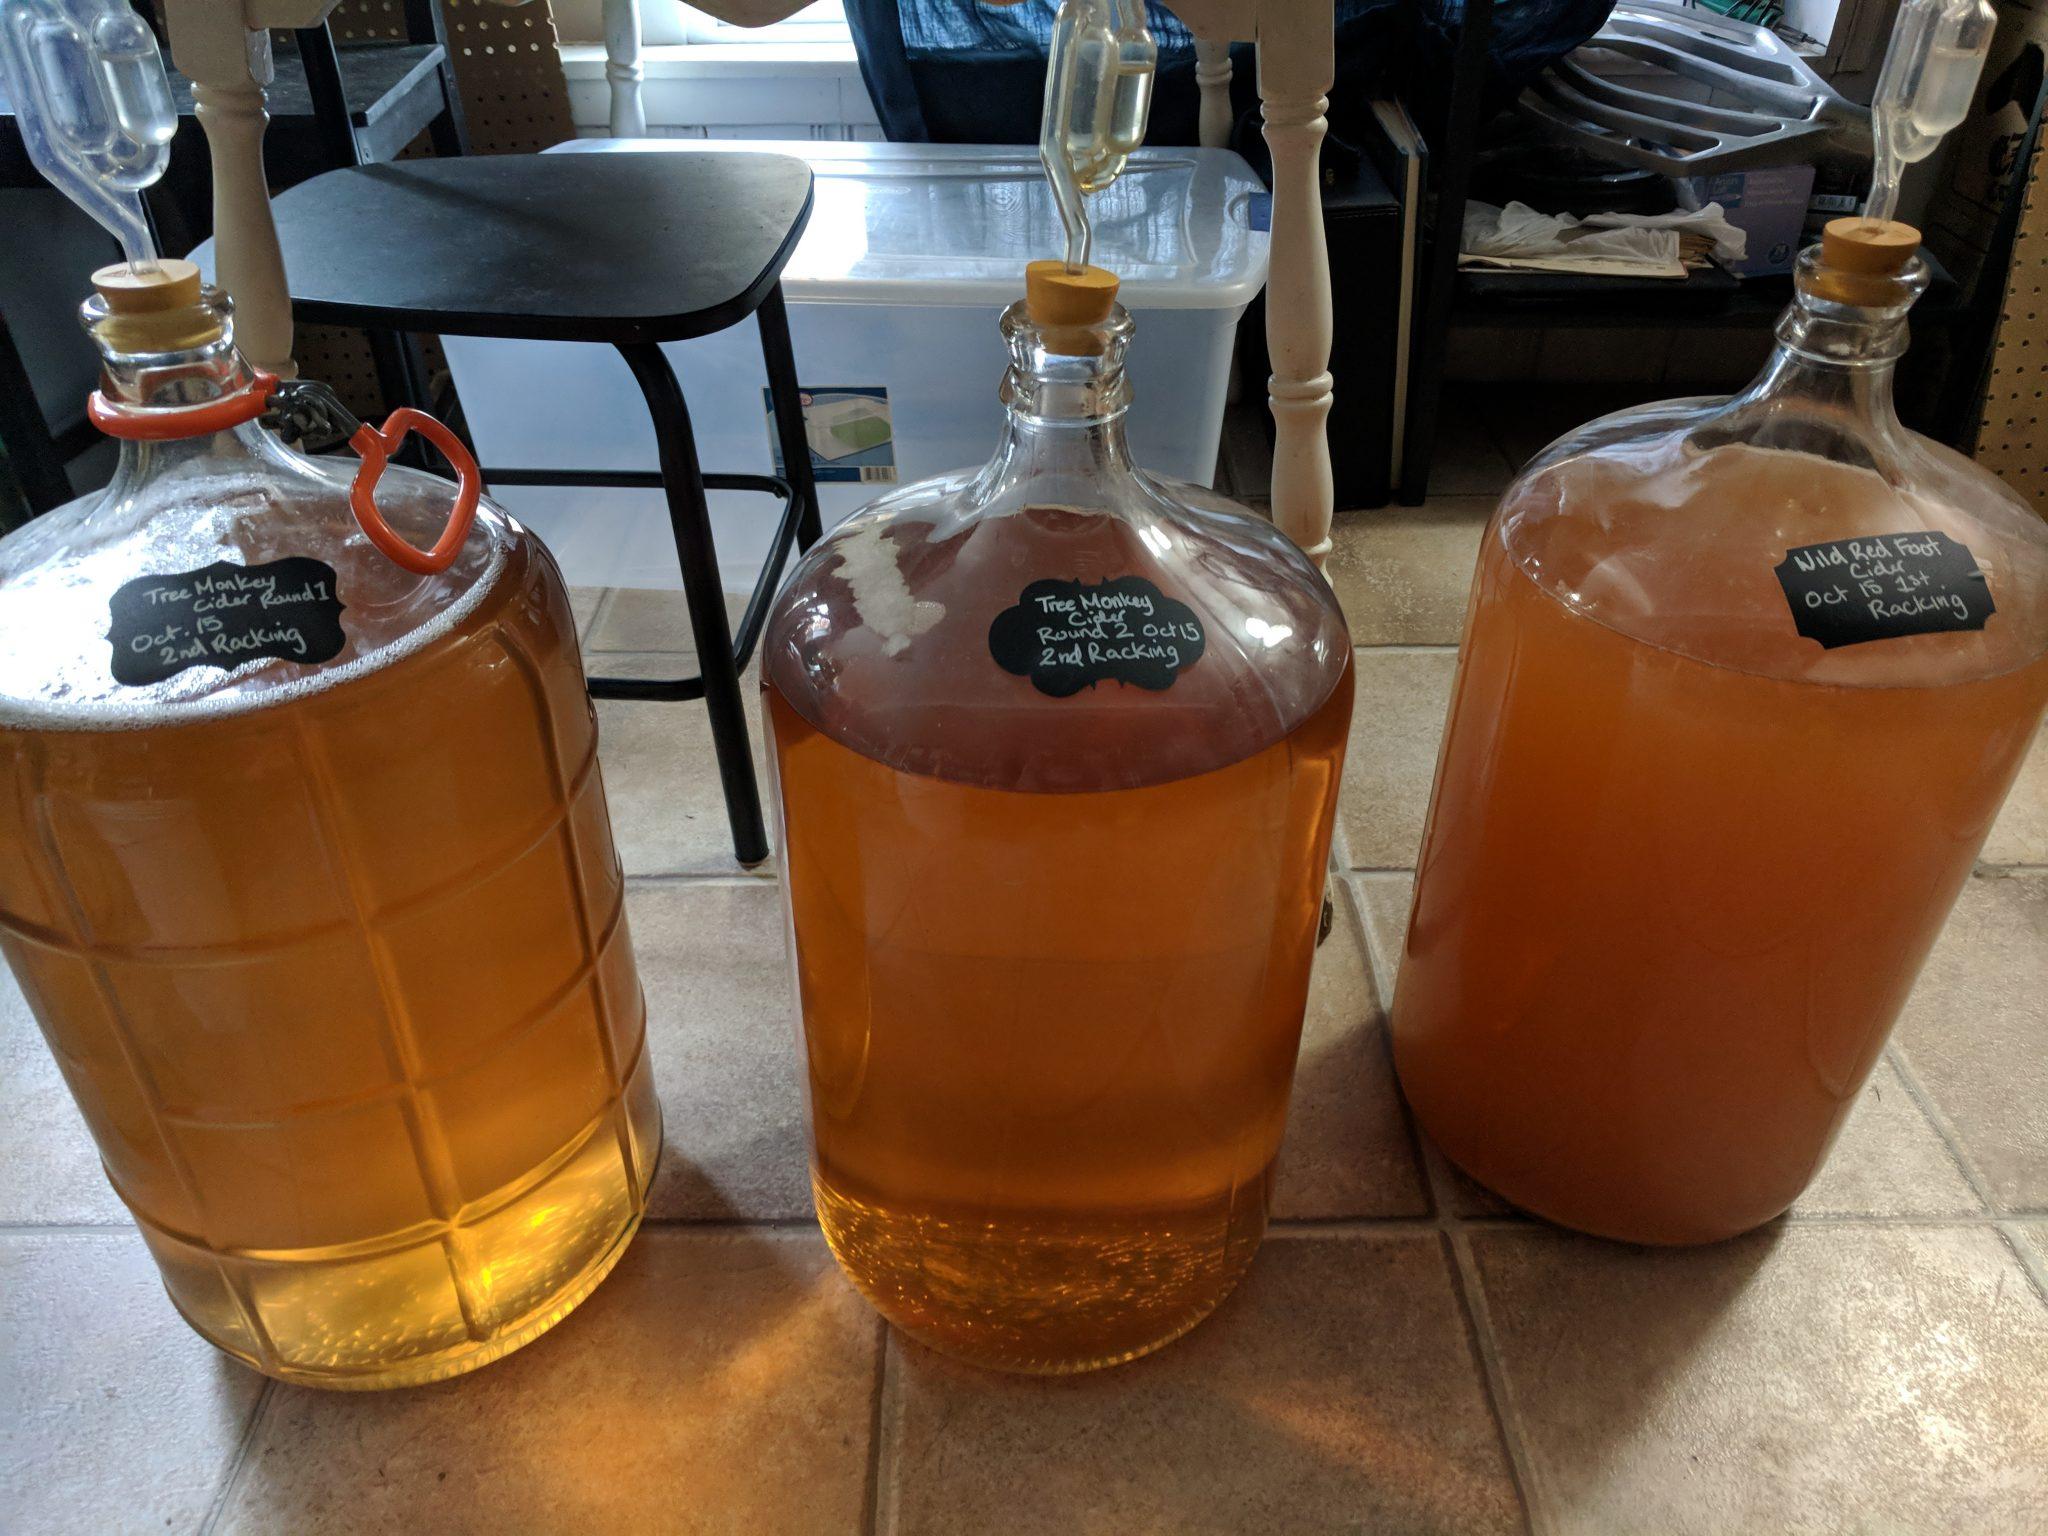 Homemade Hard Cider Making: Part 2